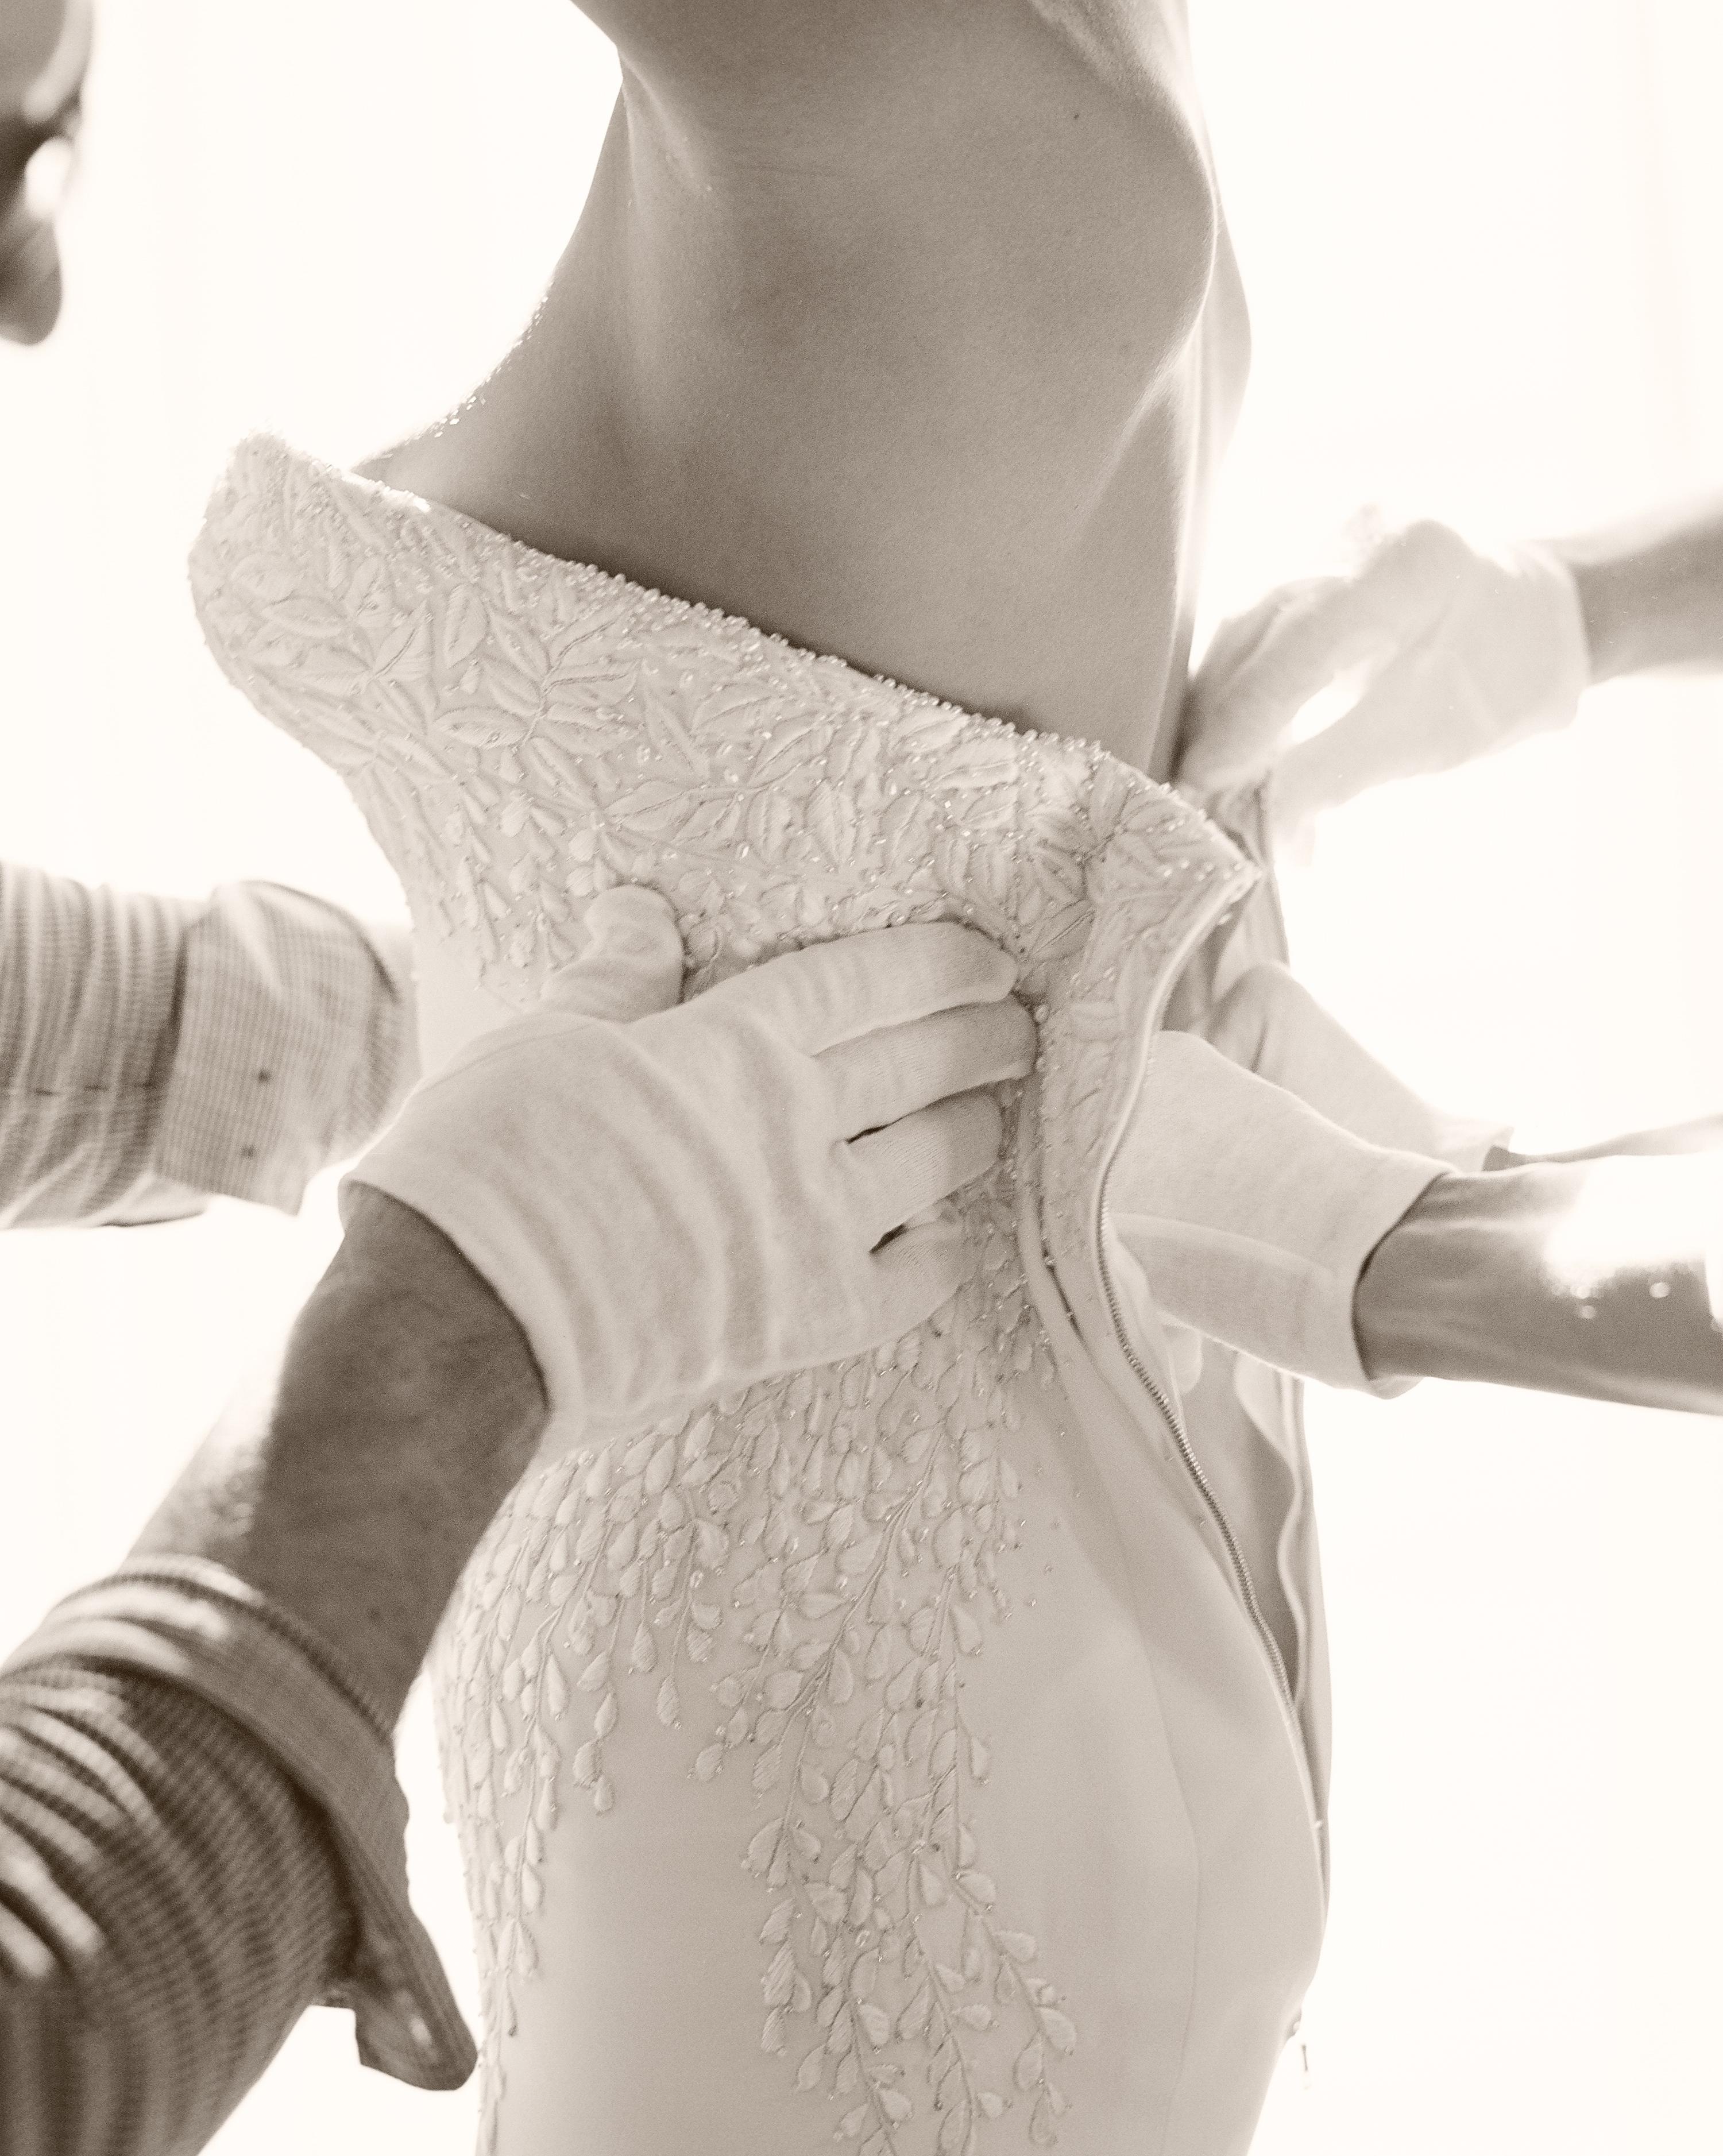 real-wedding-fall14-jojo-eric-003elizabeth-messina-ds111226-0814.jpg